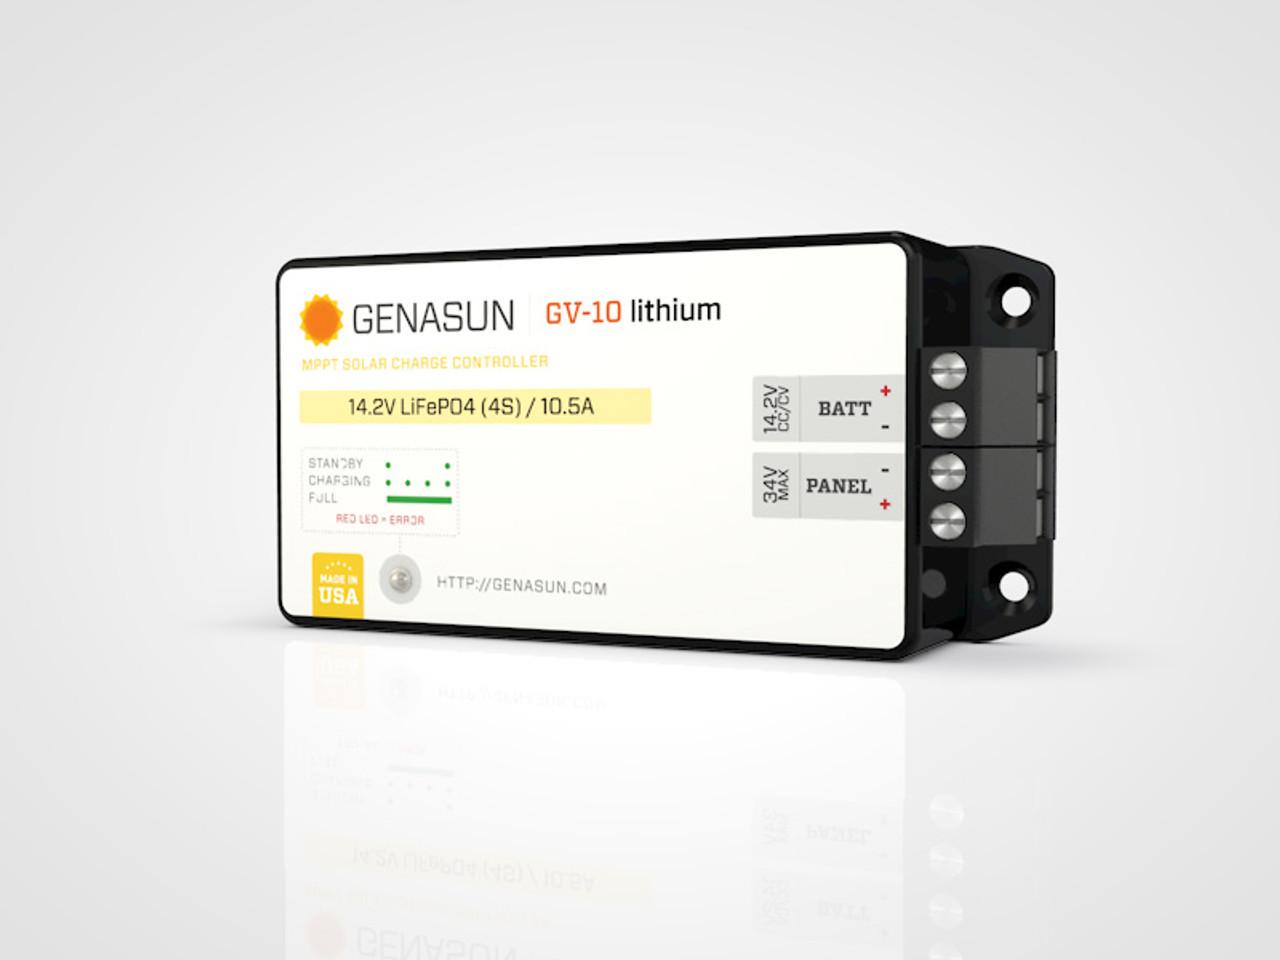 GV-10 | 140W 10A 14.6V Genasun MPPT Solar Charge Controller - Li - Right1